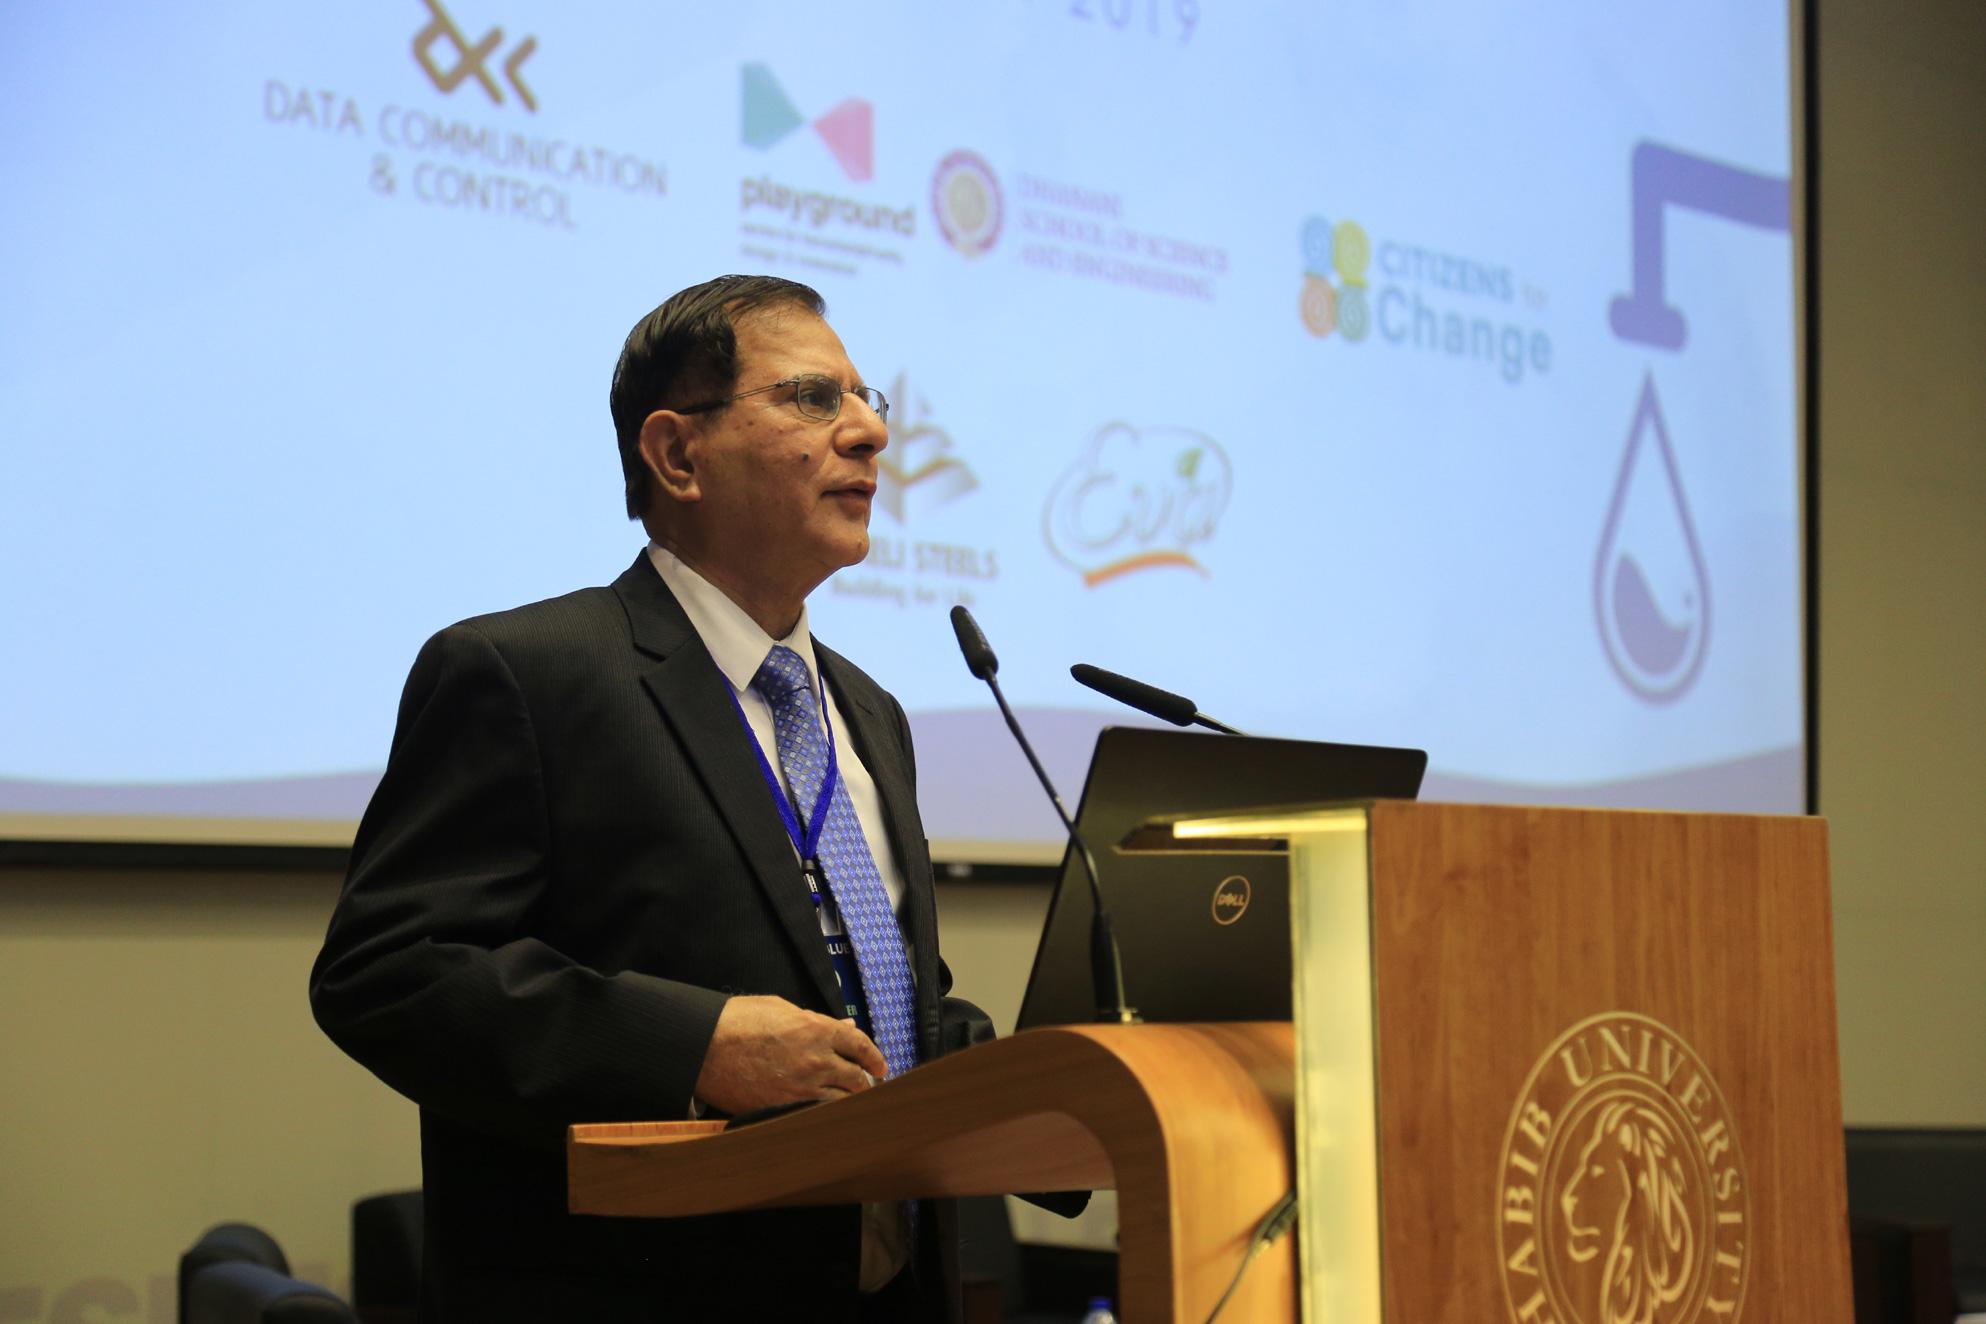 Mr. Samir Hoodbhoy, CEO of Data Communications & Control (Pvt) Ltd.